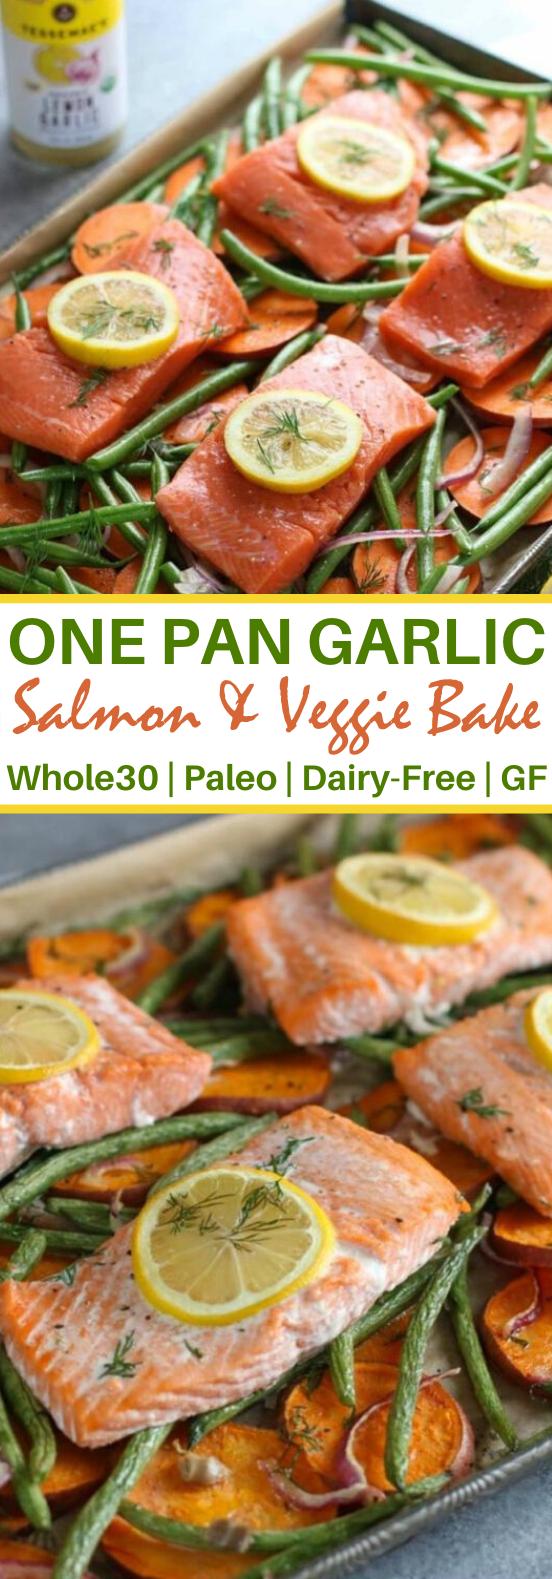 One-pan Salmon and Veggie Bake #healthy #paleo #glutenfree #whole30 #dinner